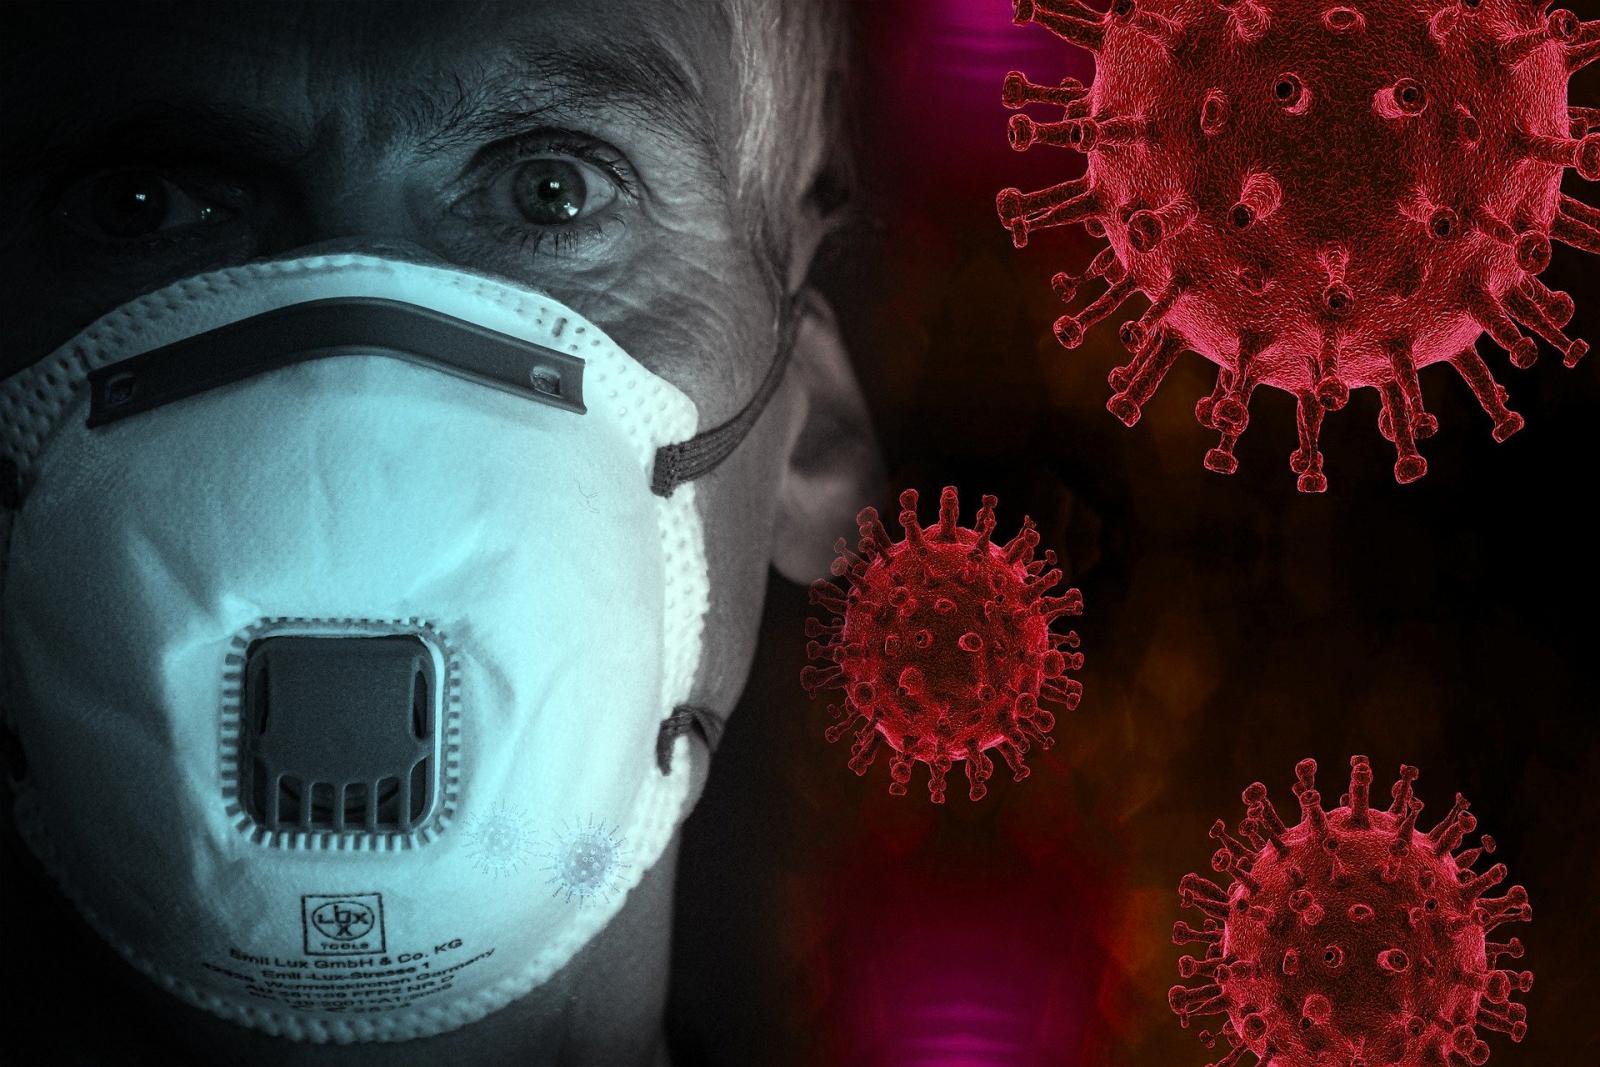 New Tracker App Allows Anyone To Self-report Coronavirus Symptoms